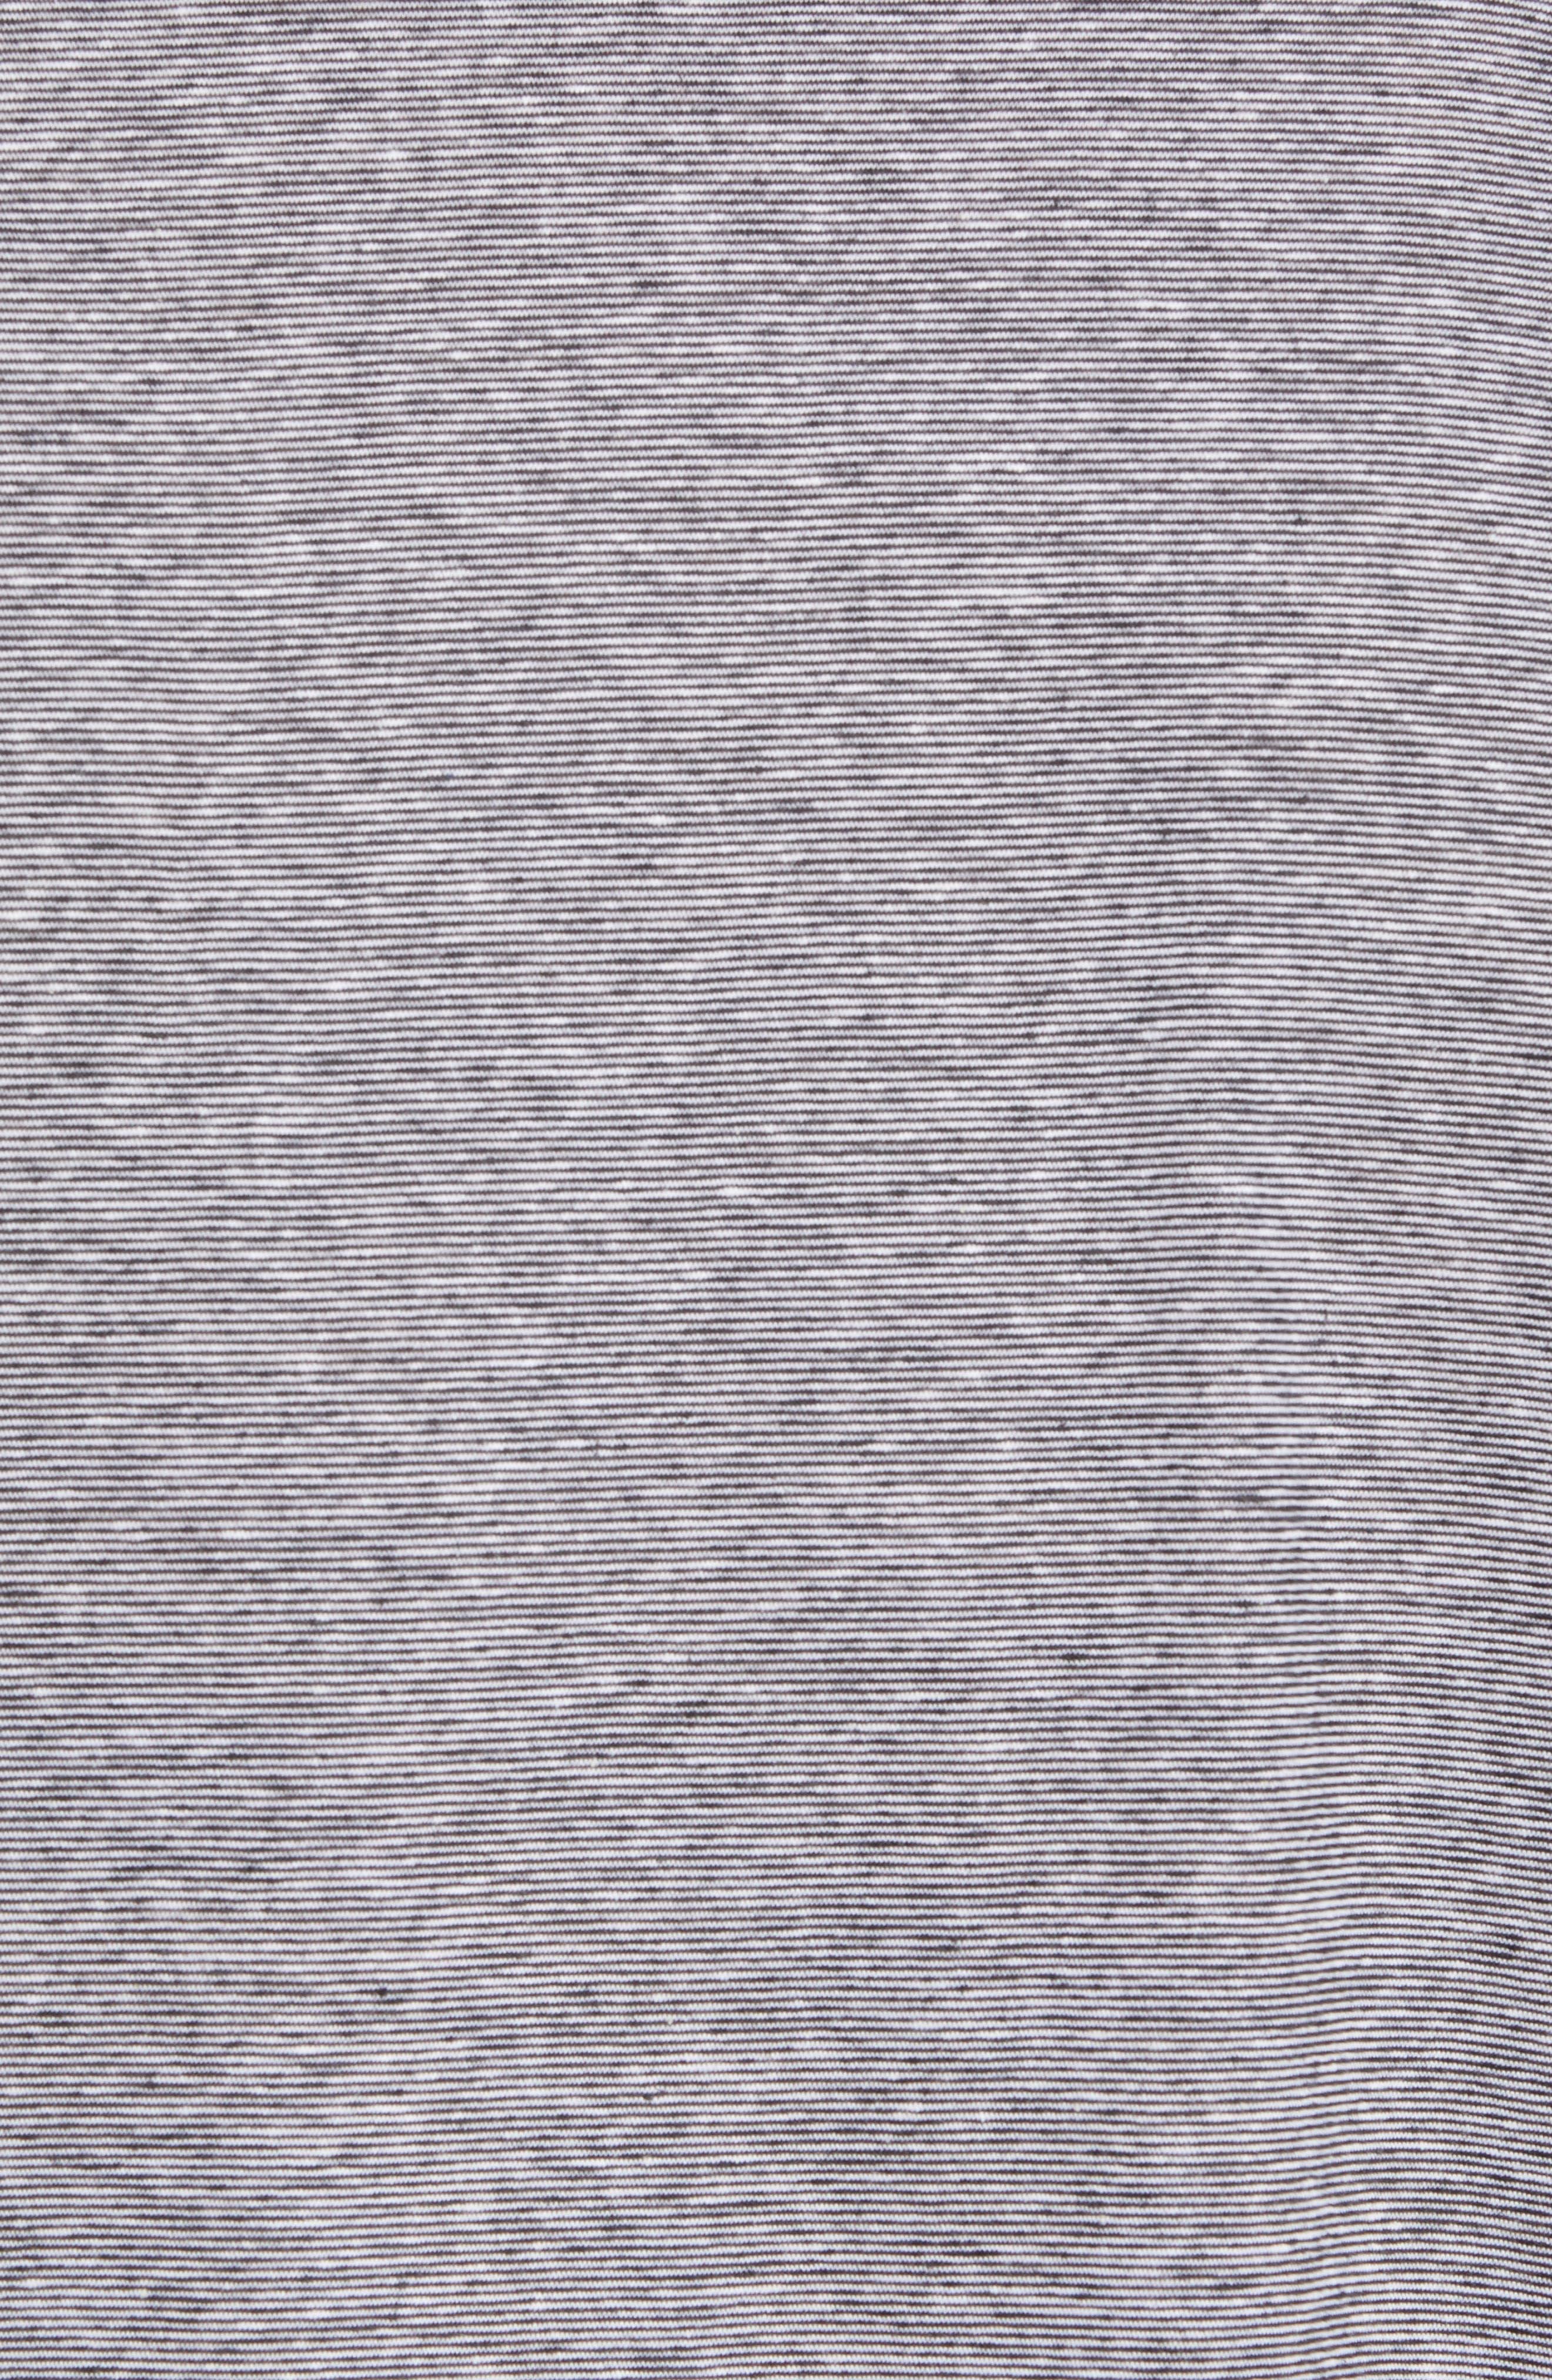 Plato Flame Polo Shirt,                             Alternate thumbnail 5, color,                             001